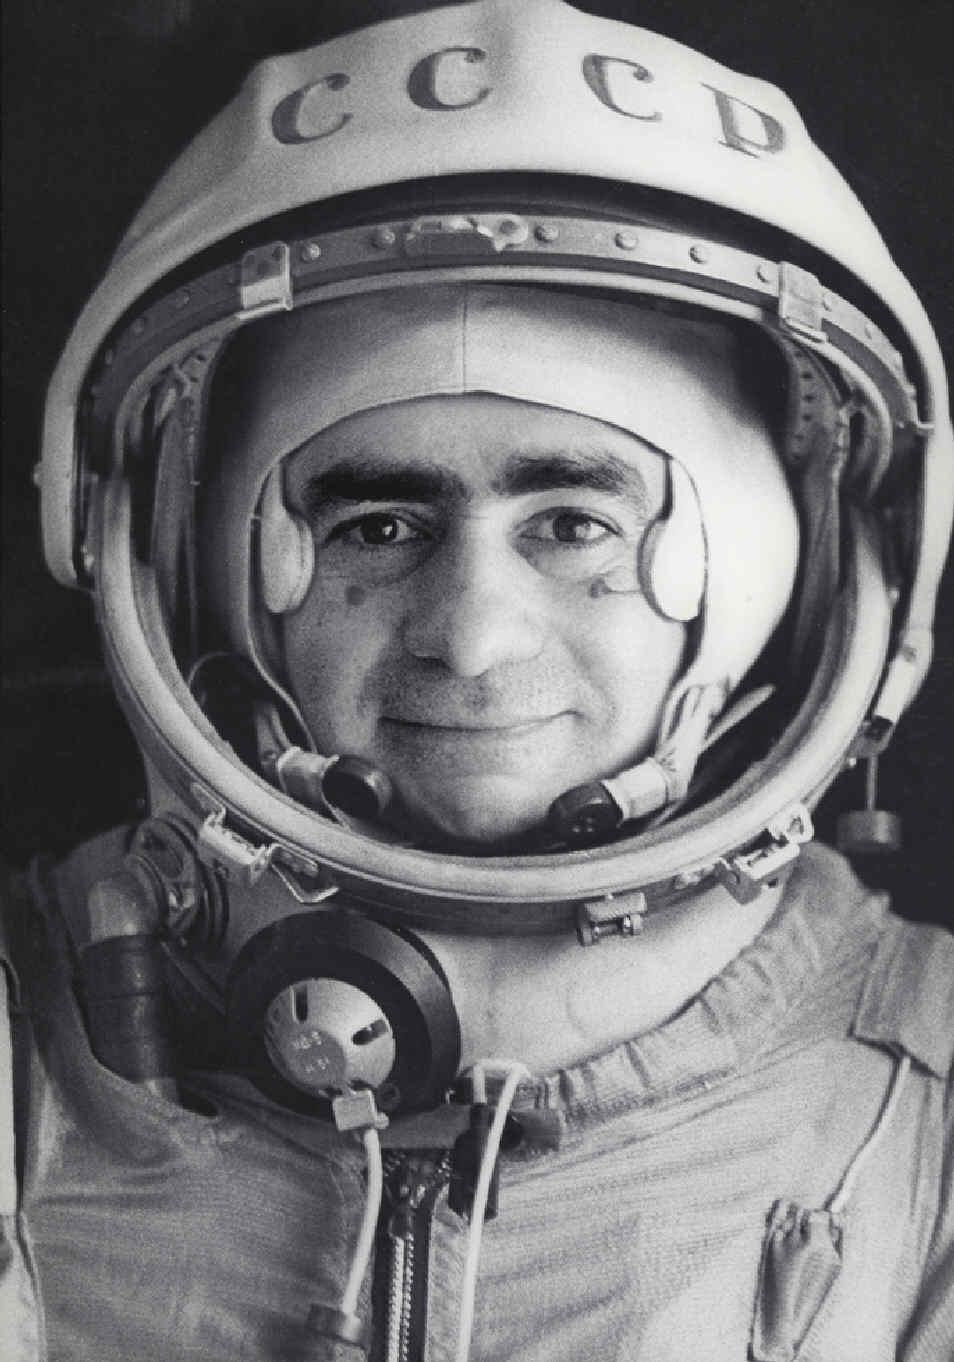 retrato-oficial-del-cosmonatura-ivan-istochnikov1